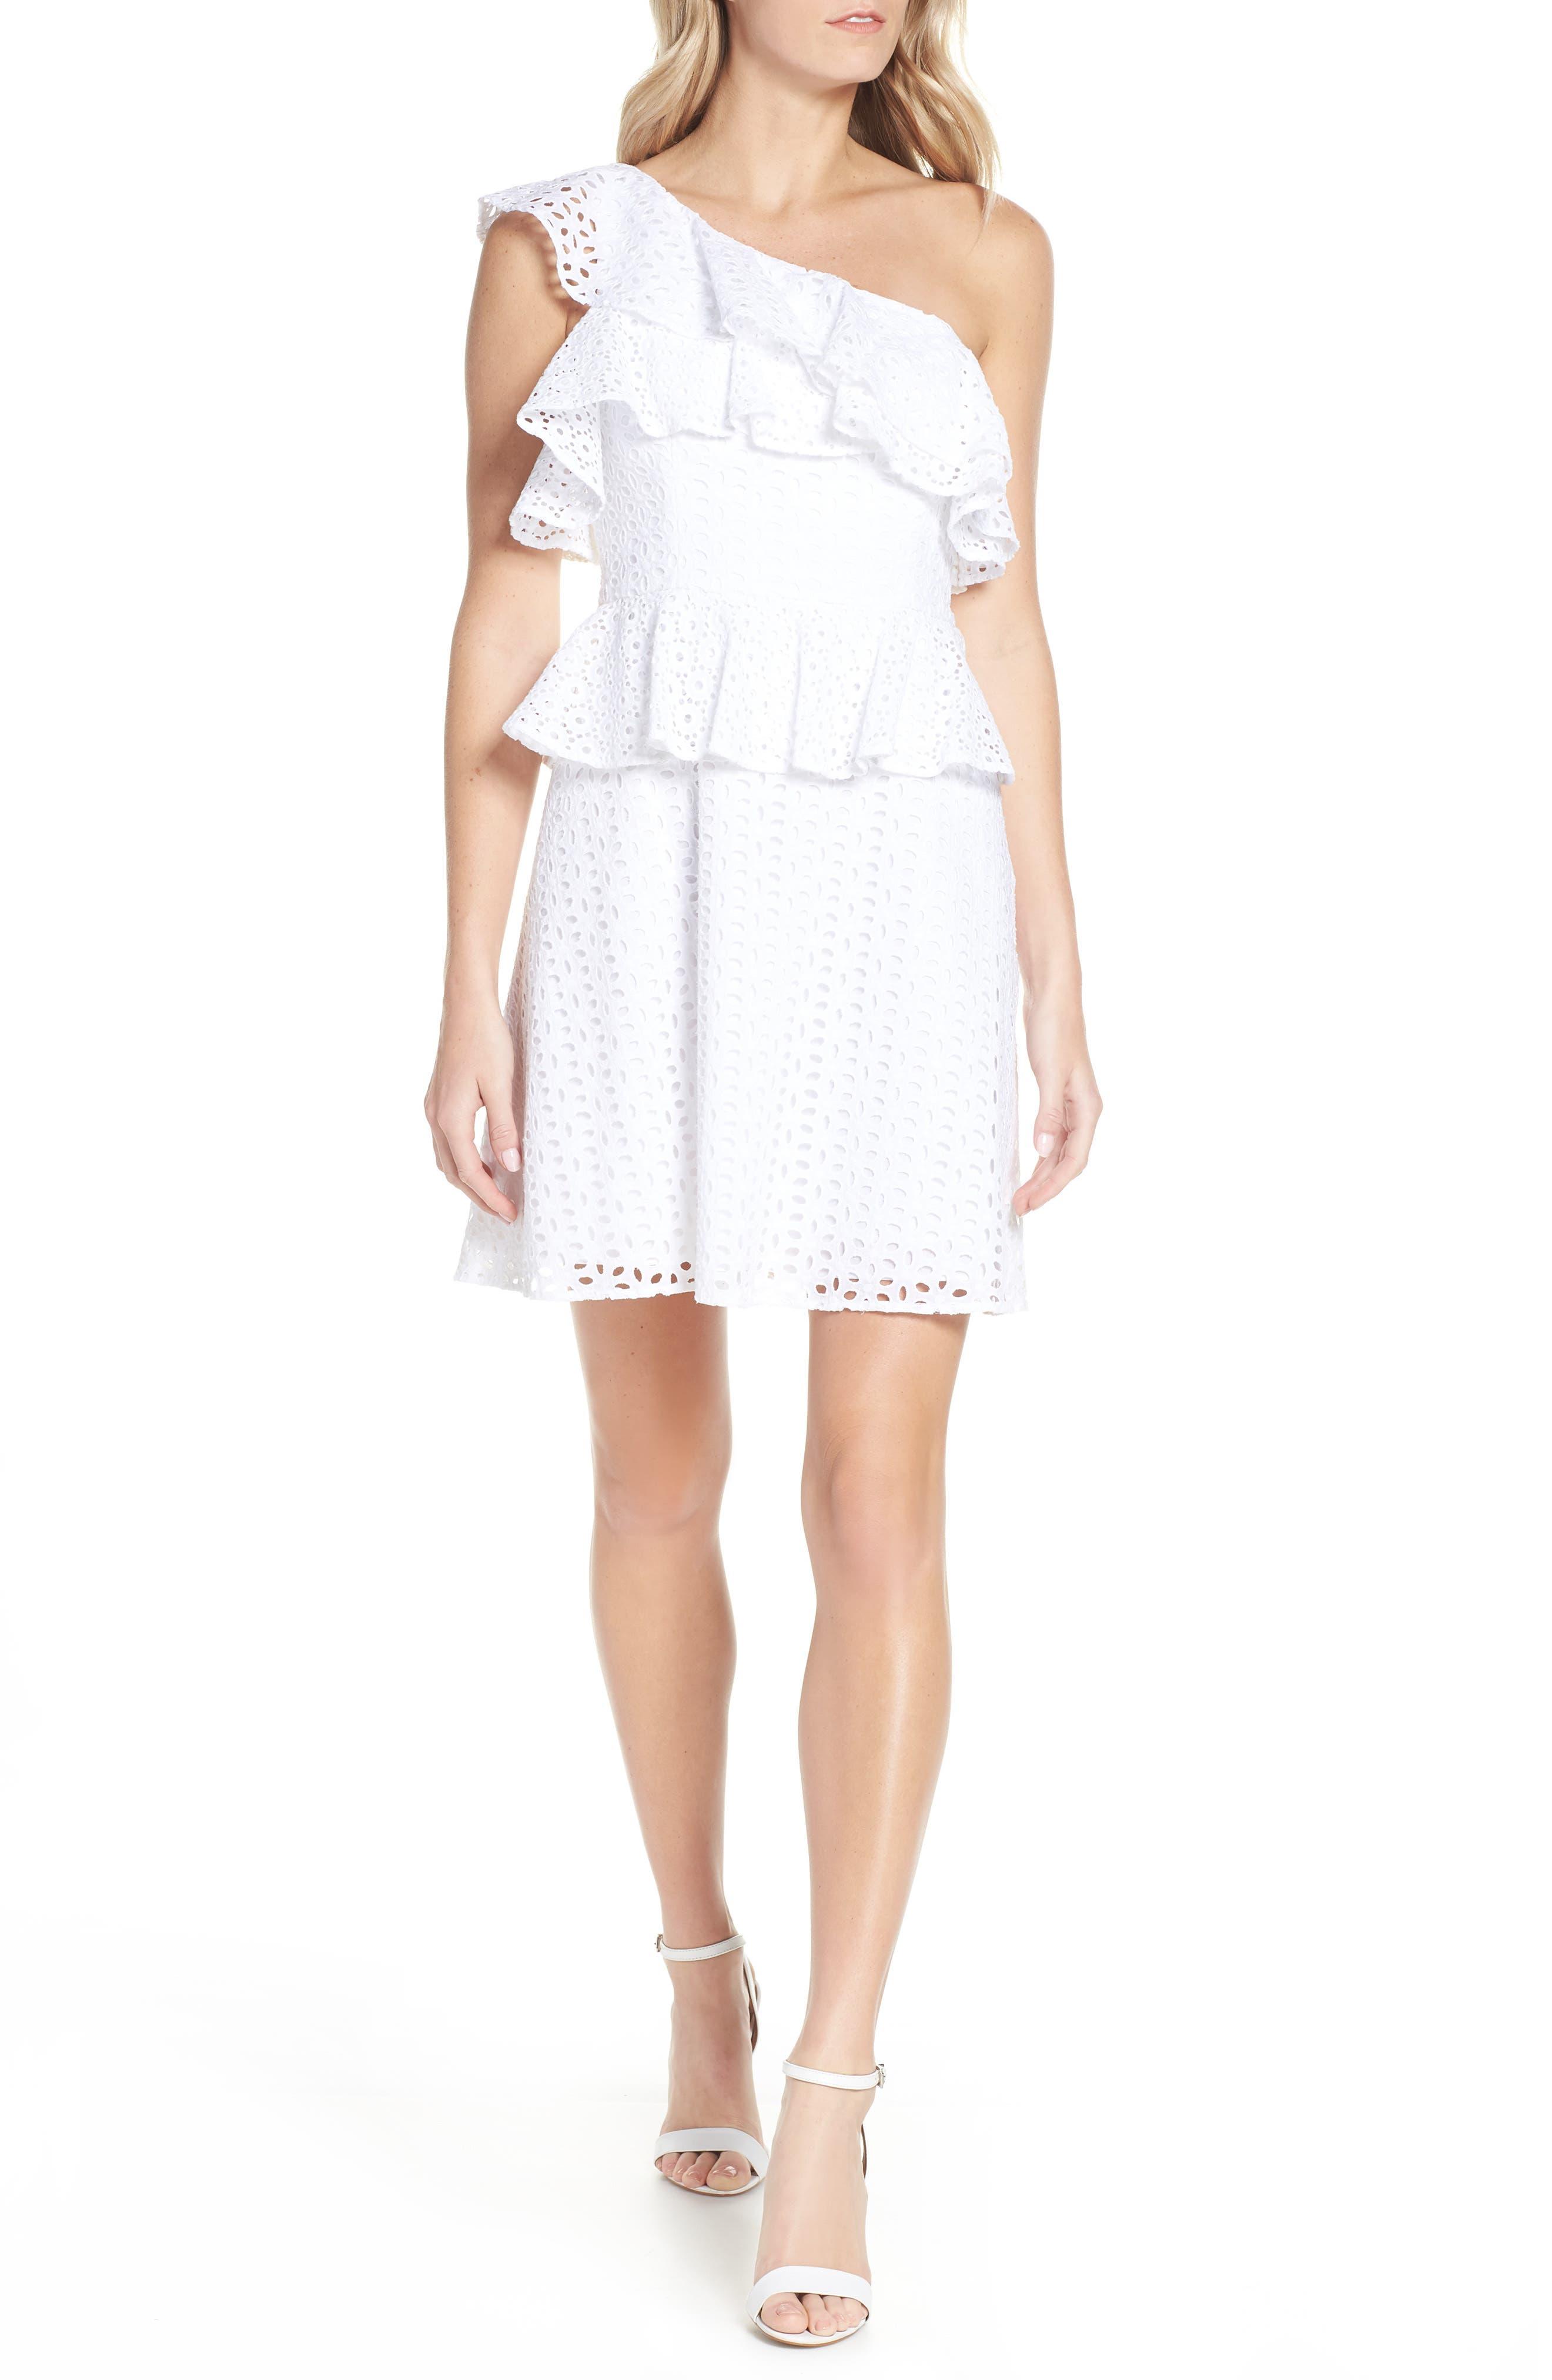 Lilly Pulitzer Josey Eyelet One-Shoulder Dress, White